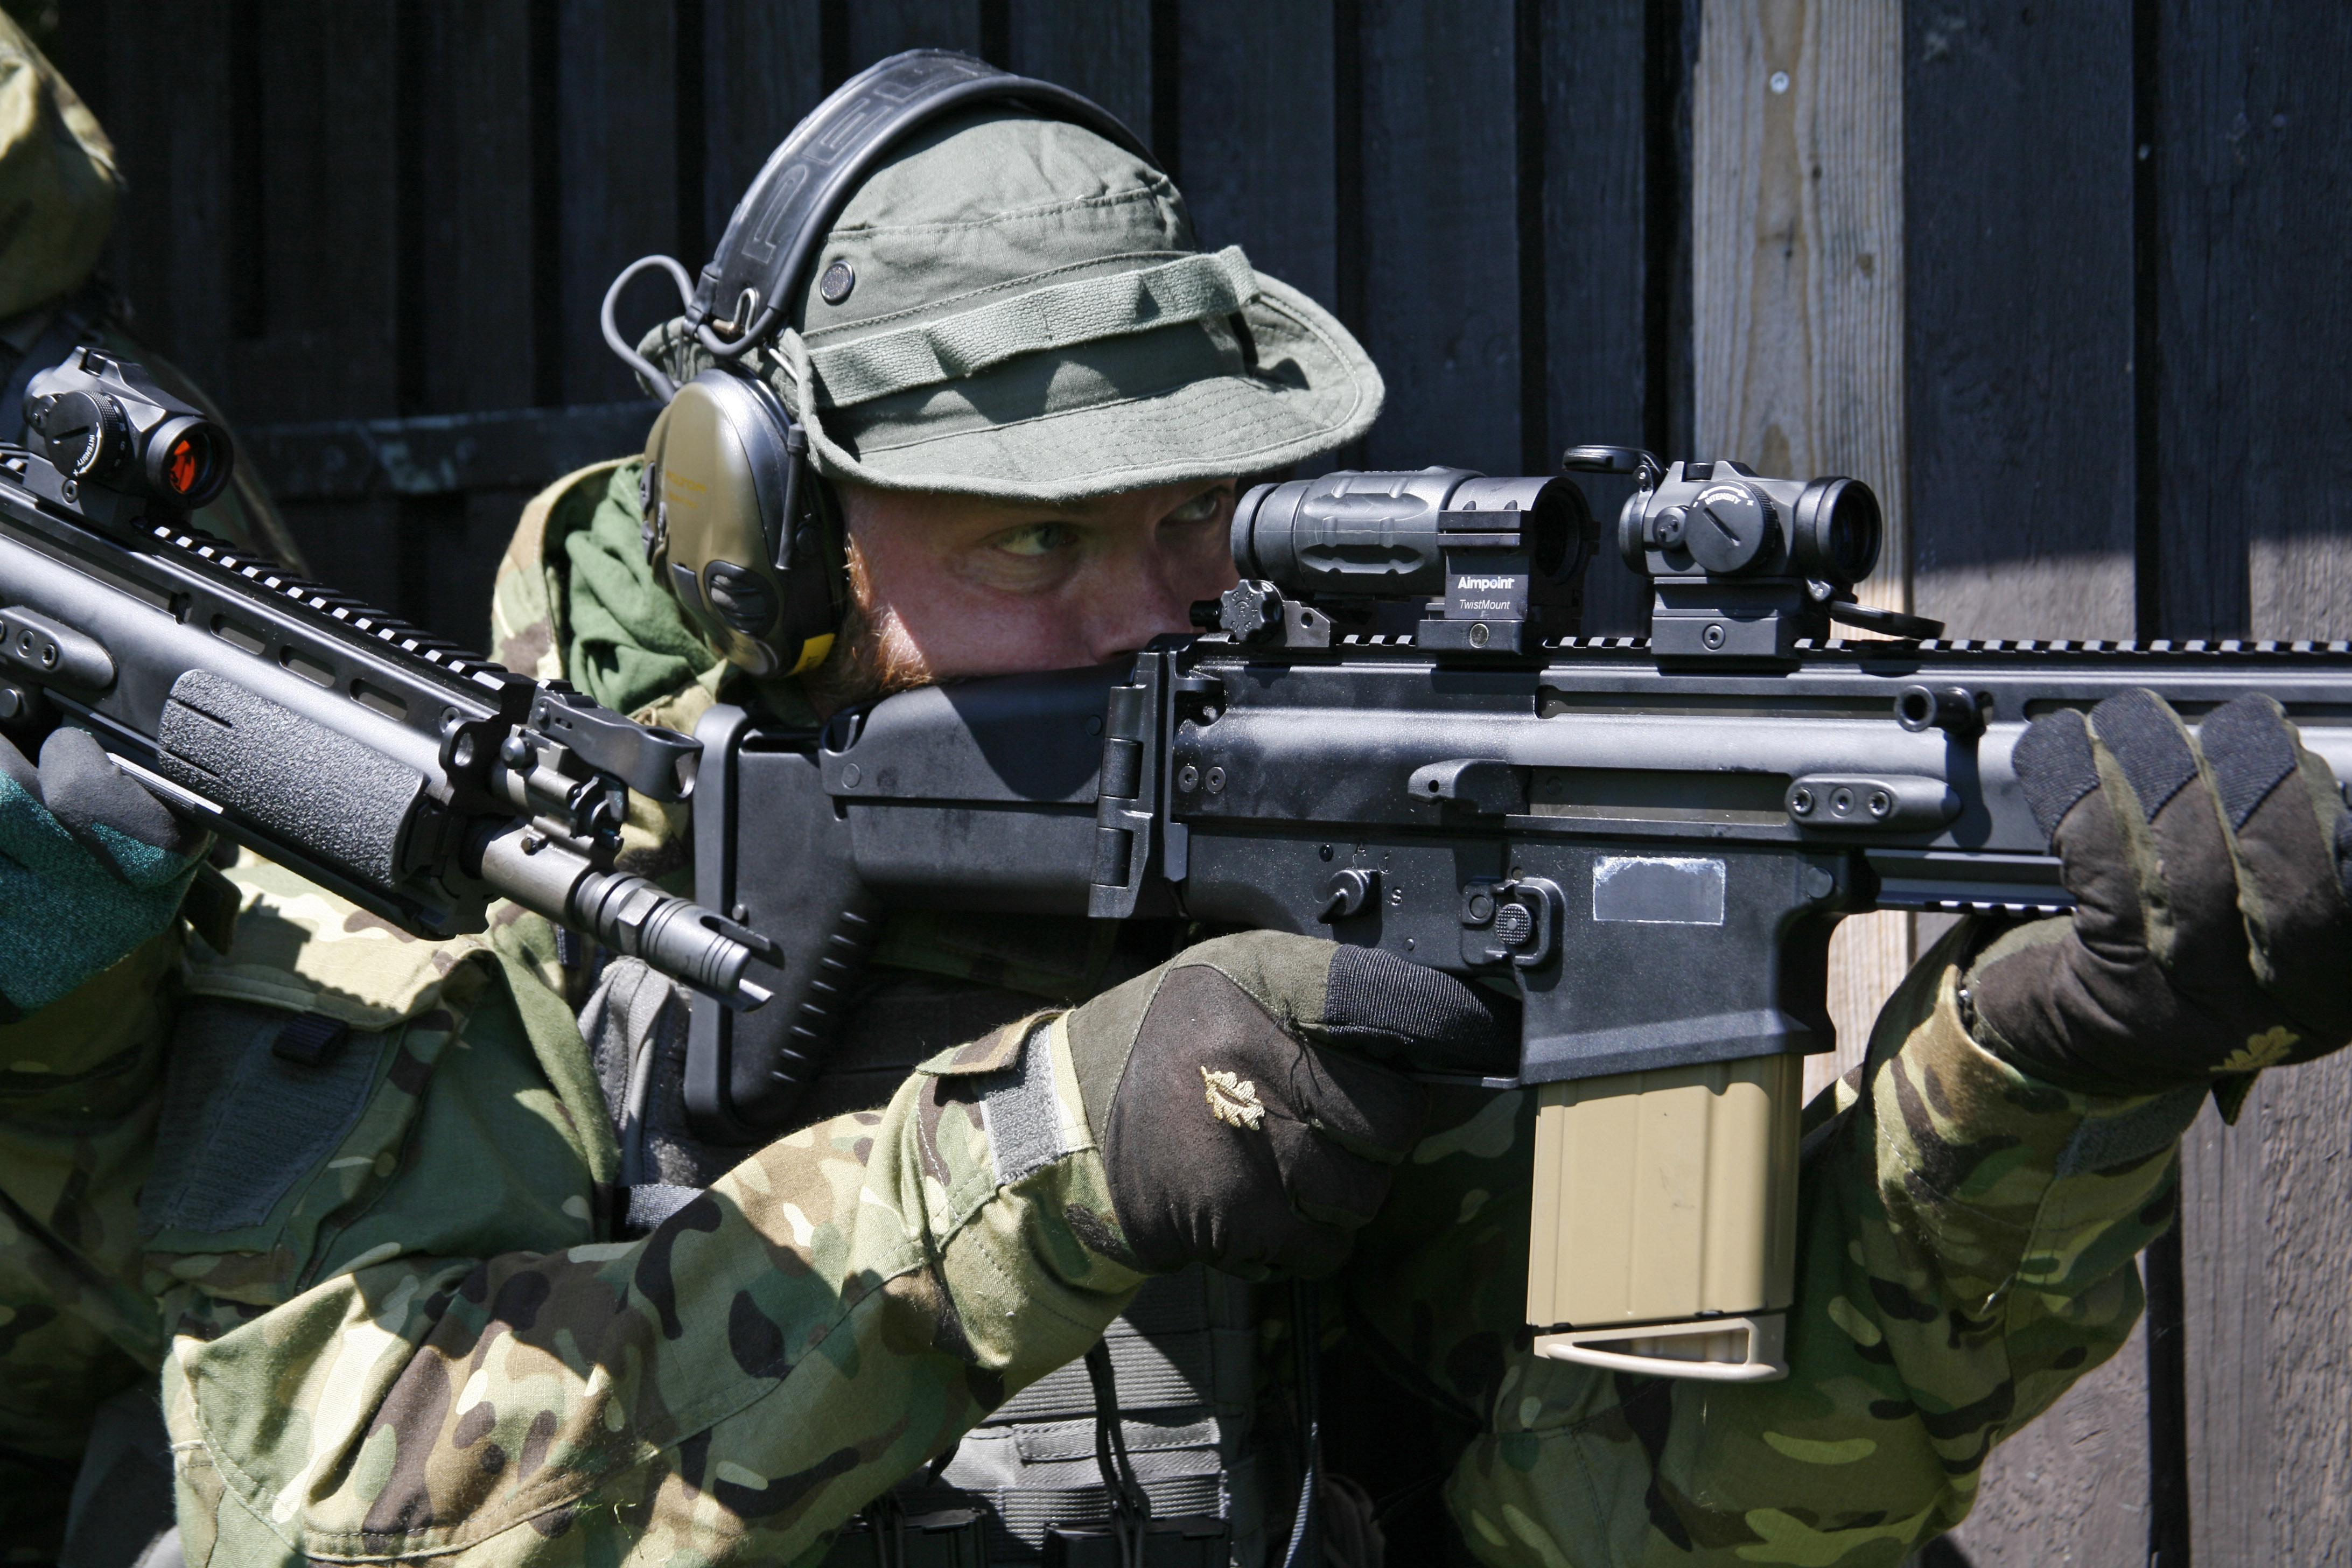 The FN Herstal SCAR-H